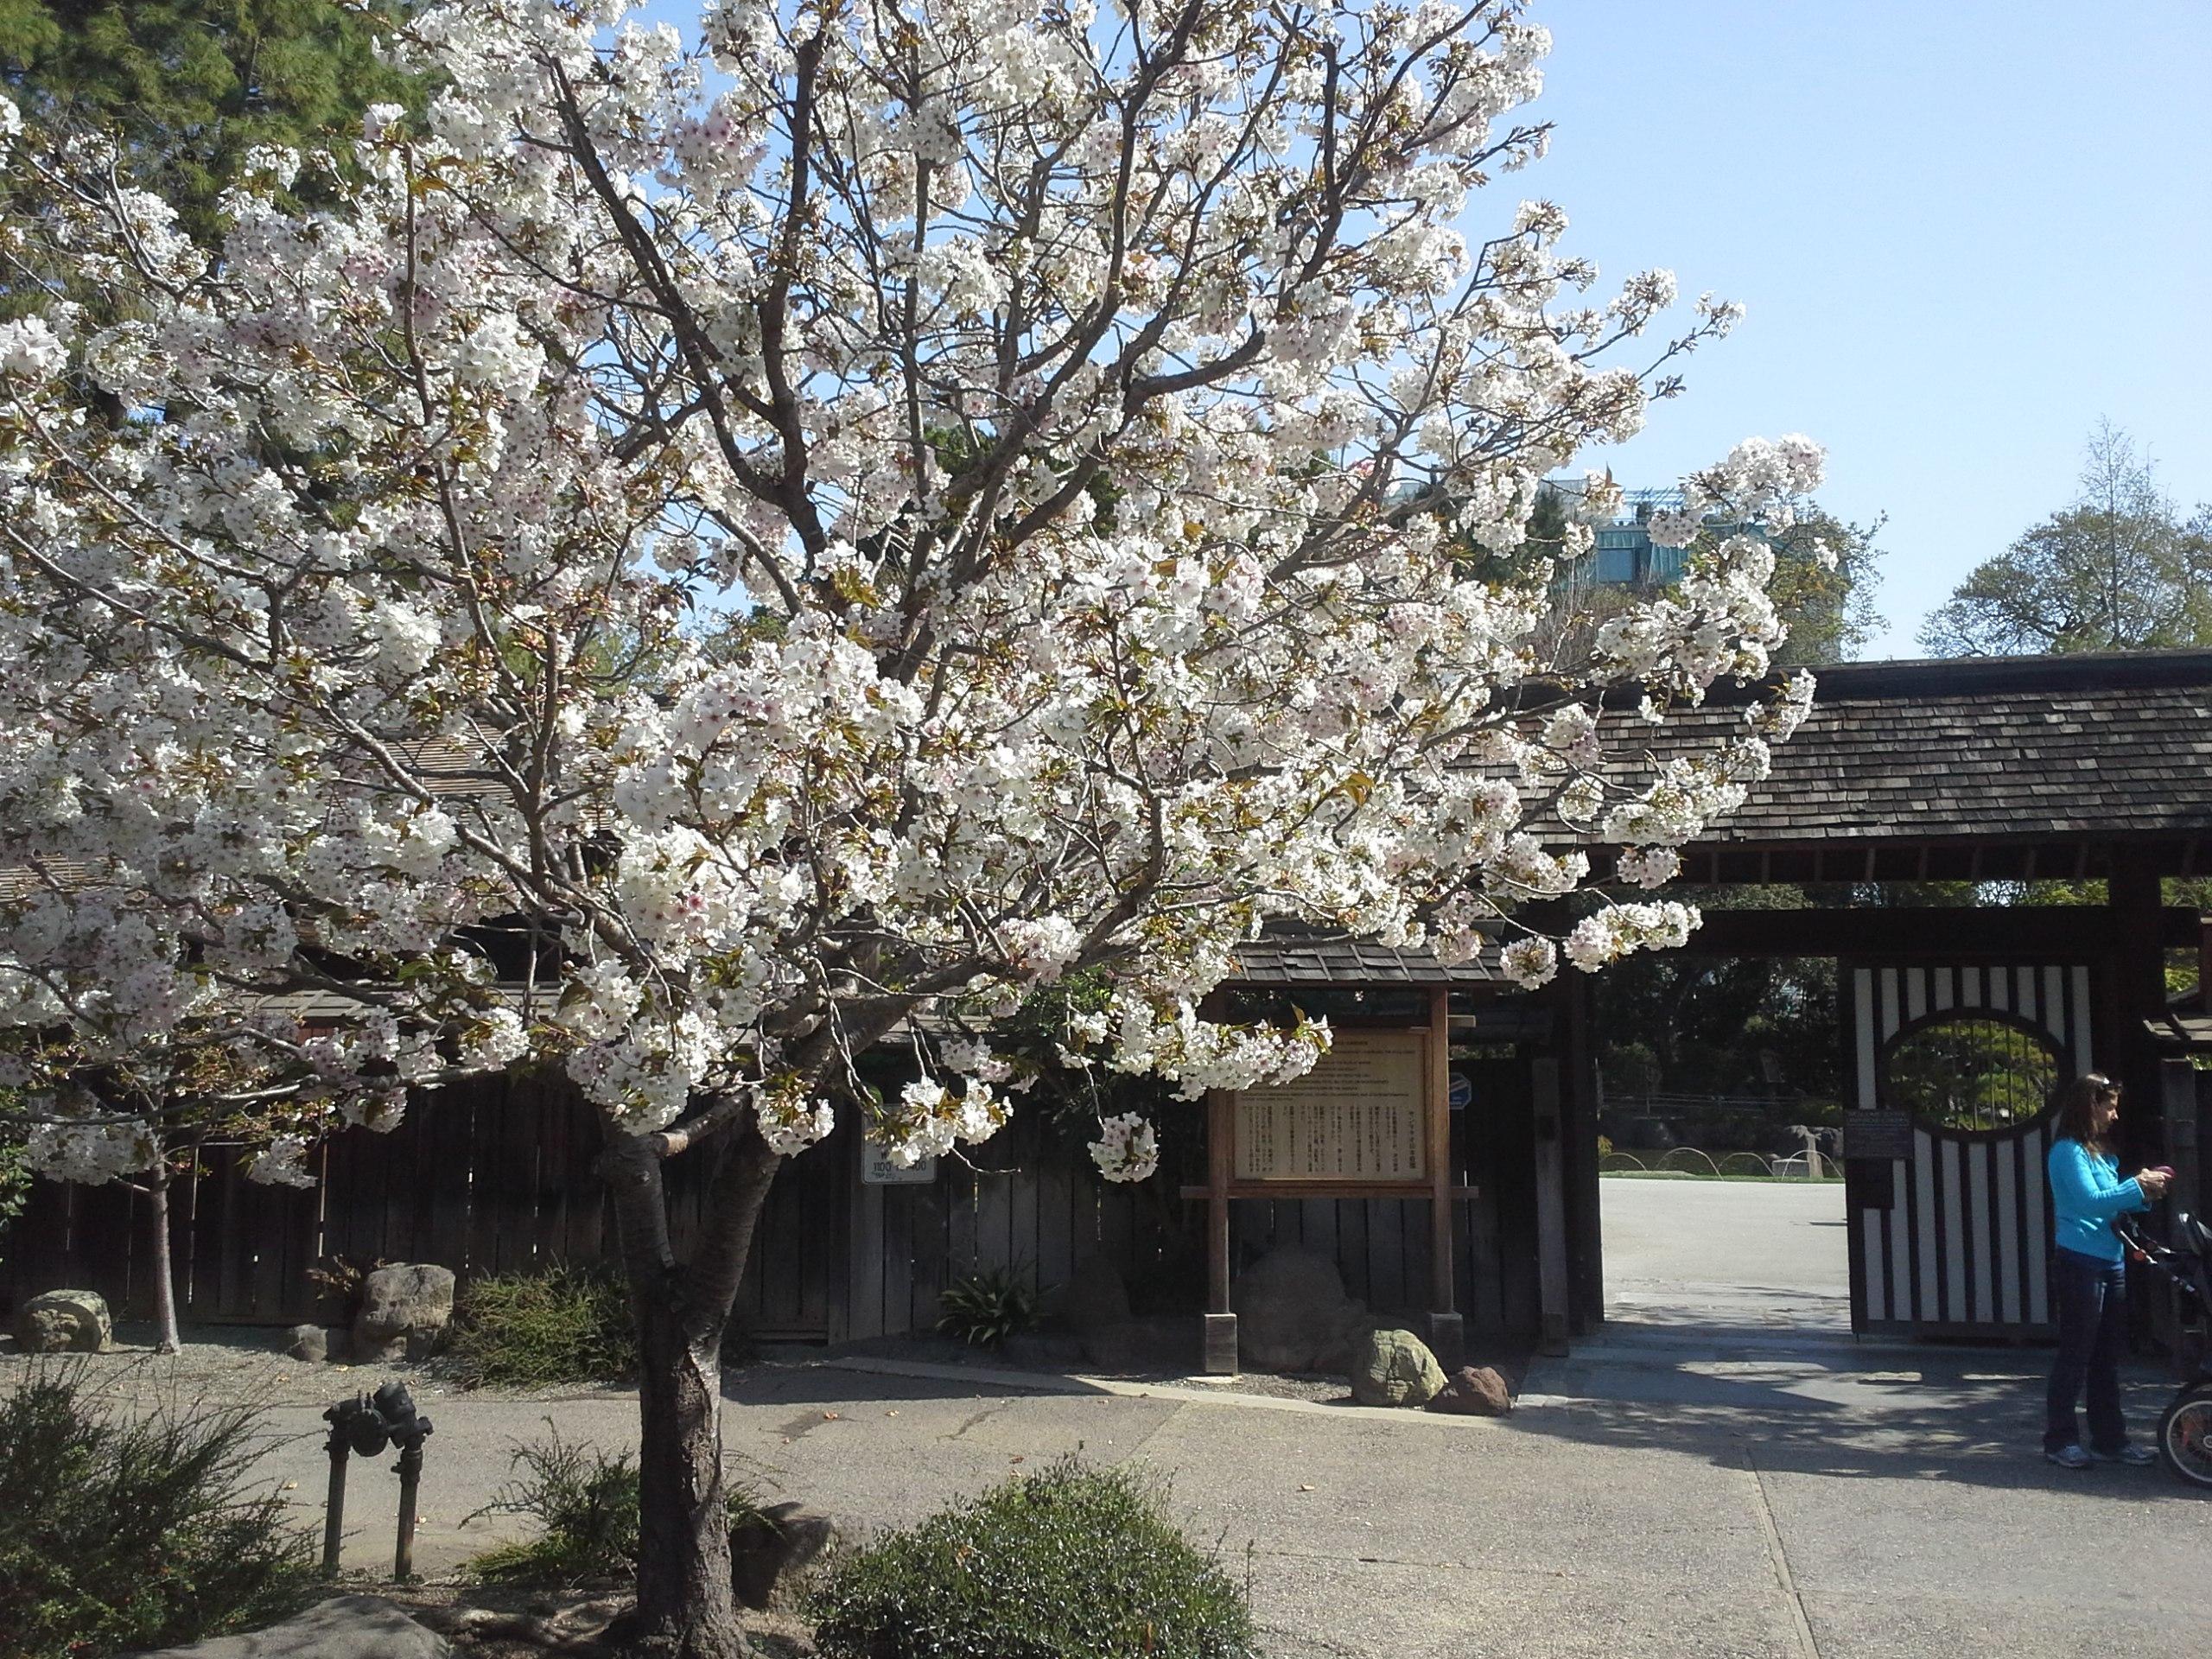 How To Grow Flowering Cherry Growing Flowering Cherry Trees